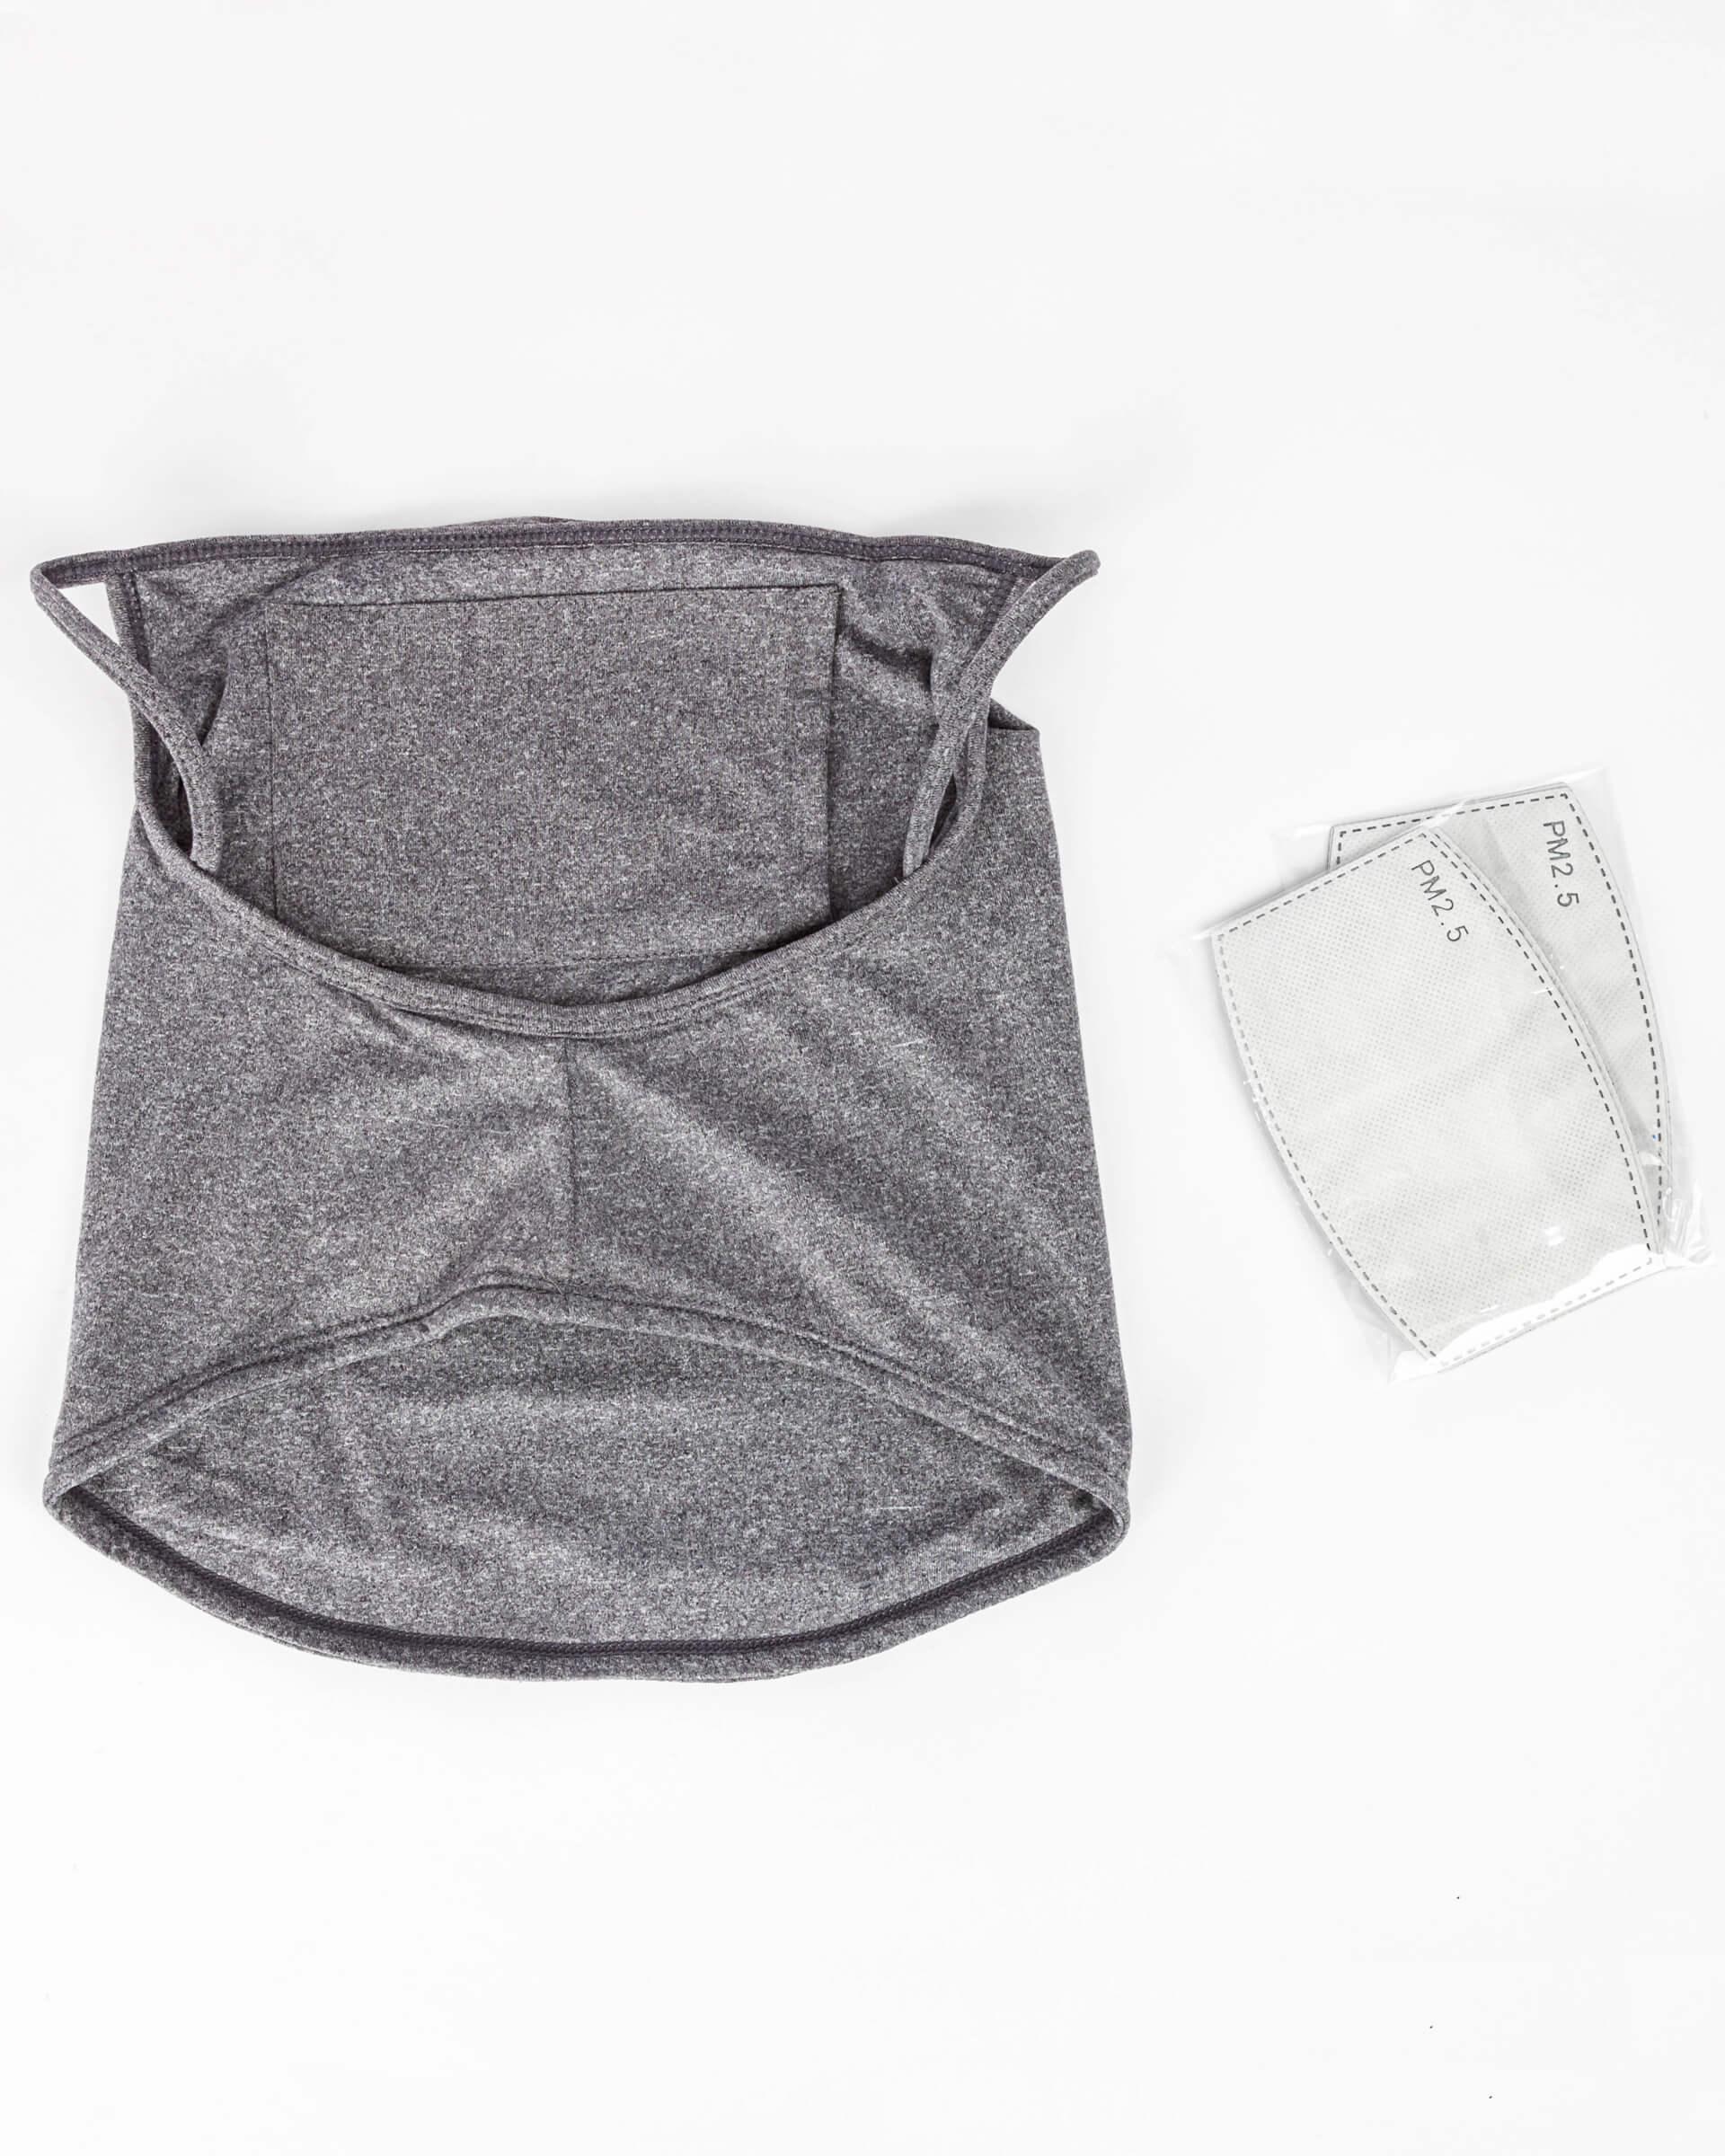 Women's Protective Face Mask Gaiter w/ Filter Pocket - 2PC Set